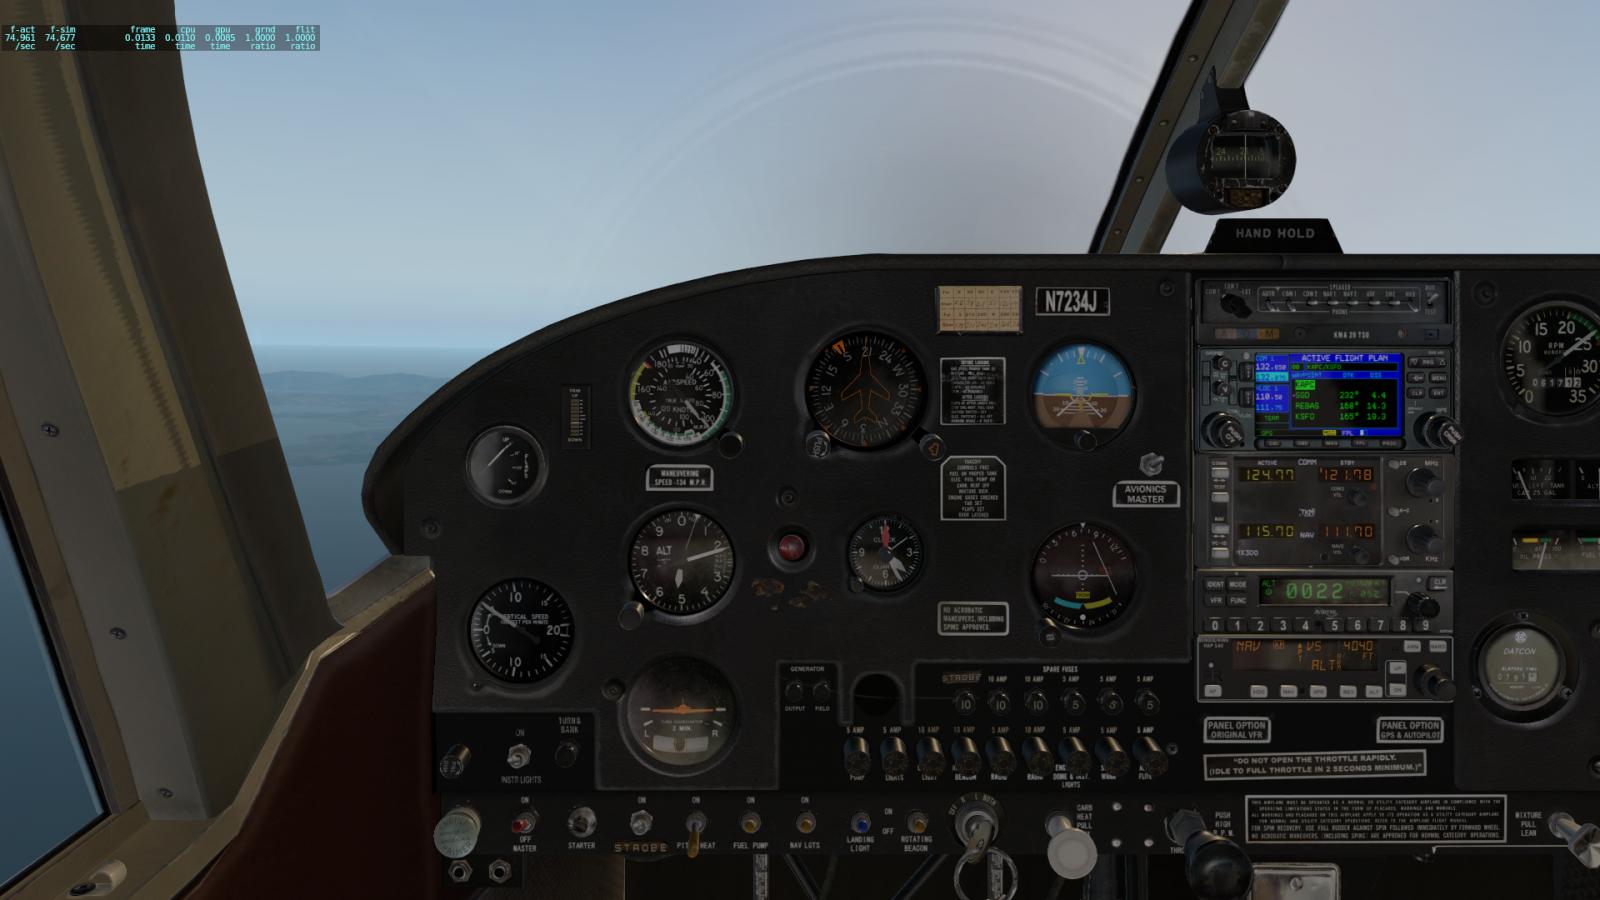 KAP 140 Autopilot for piper Cherokee 140 not working